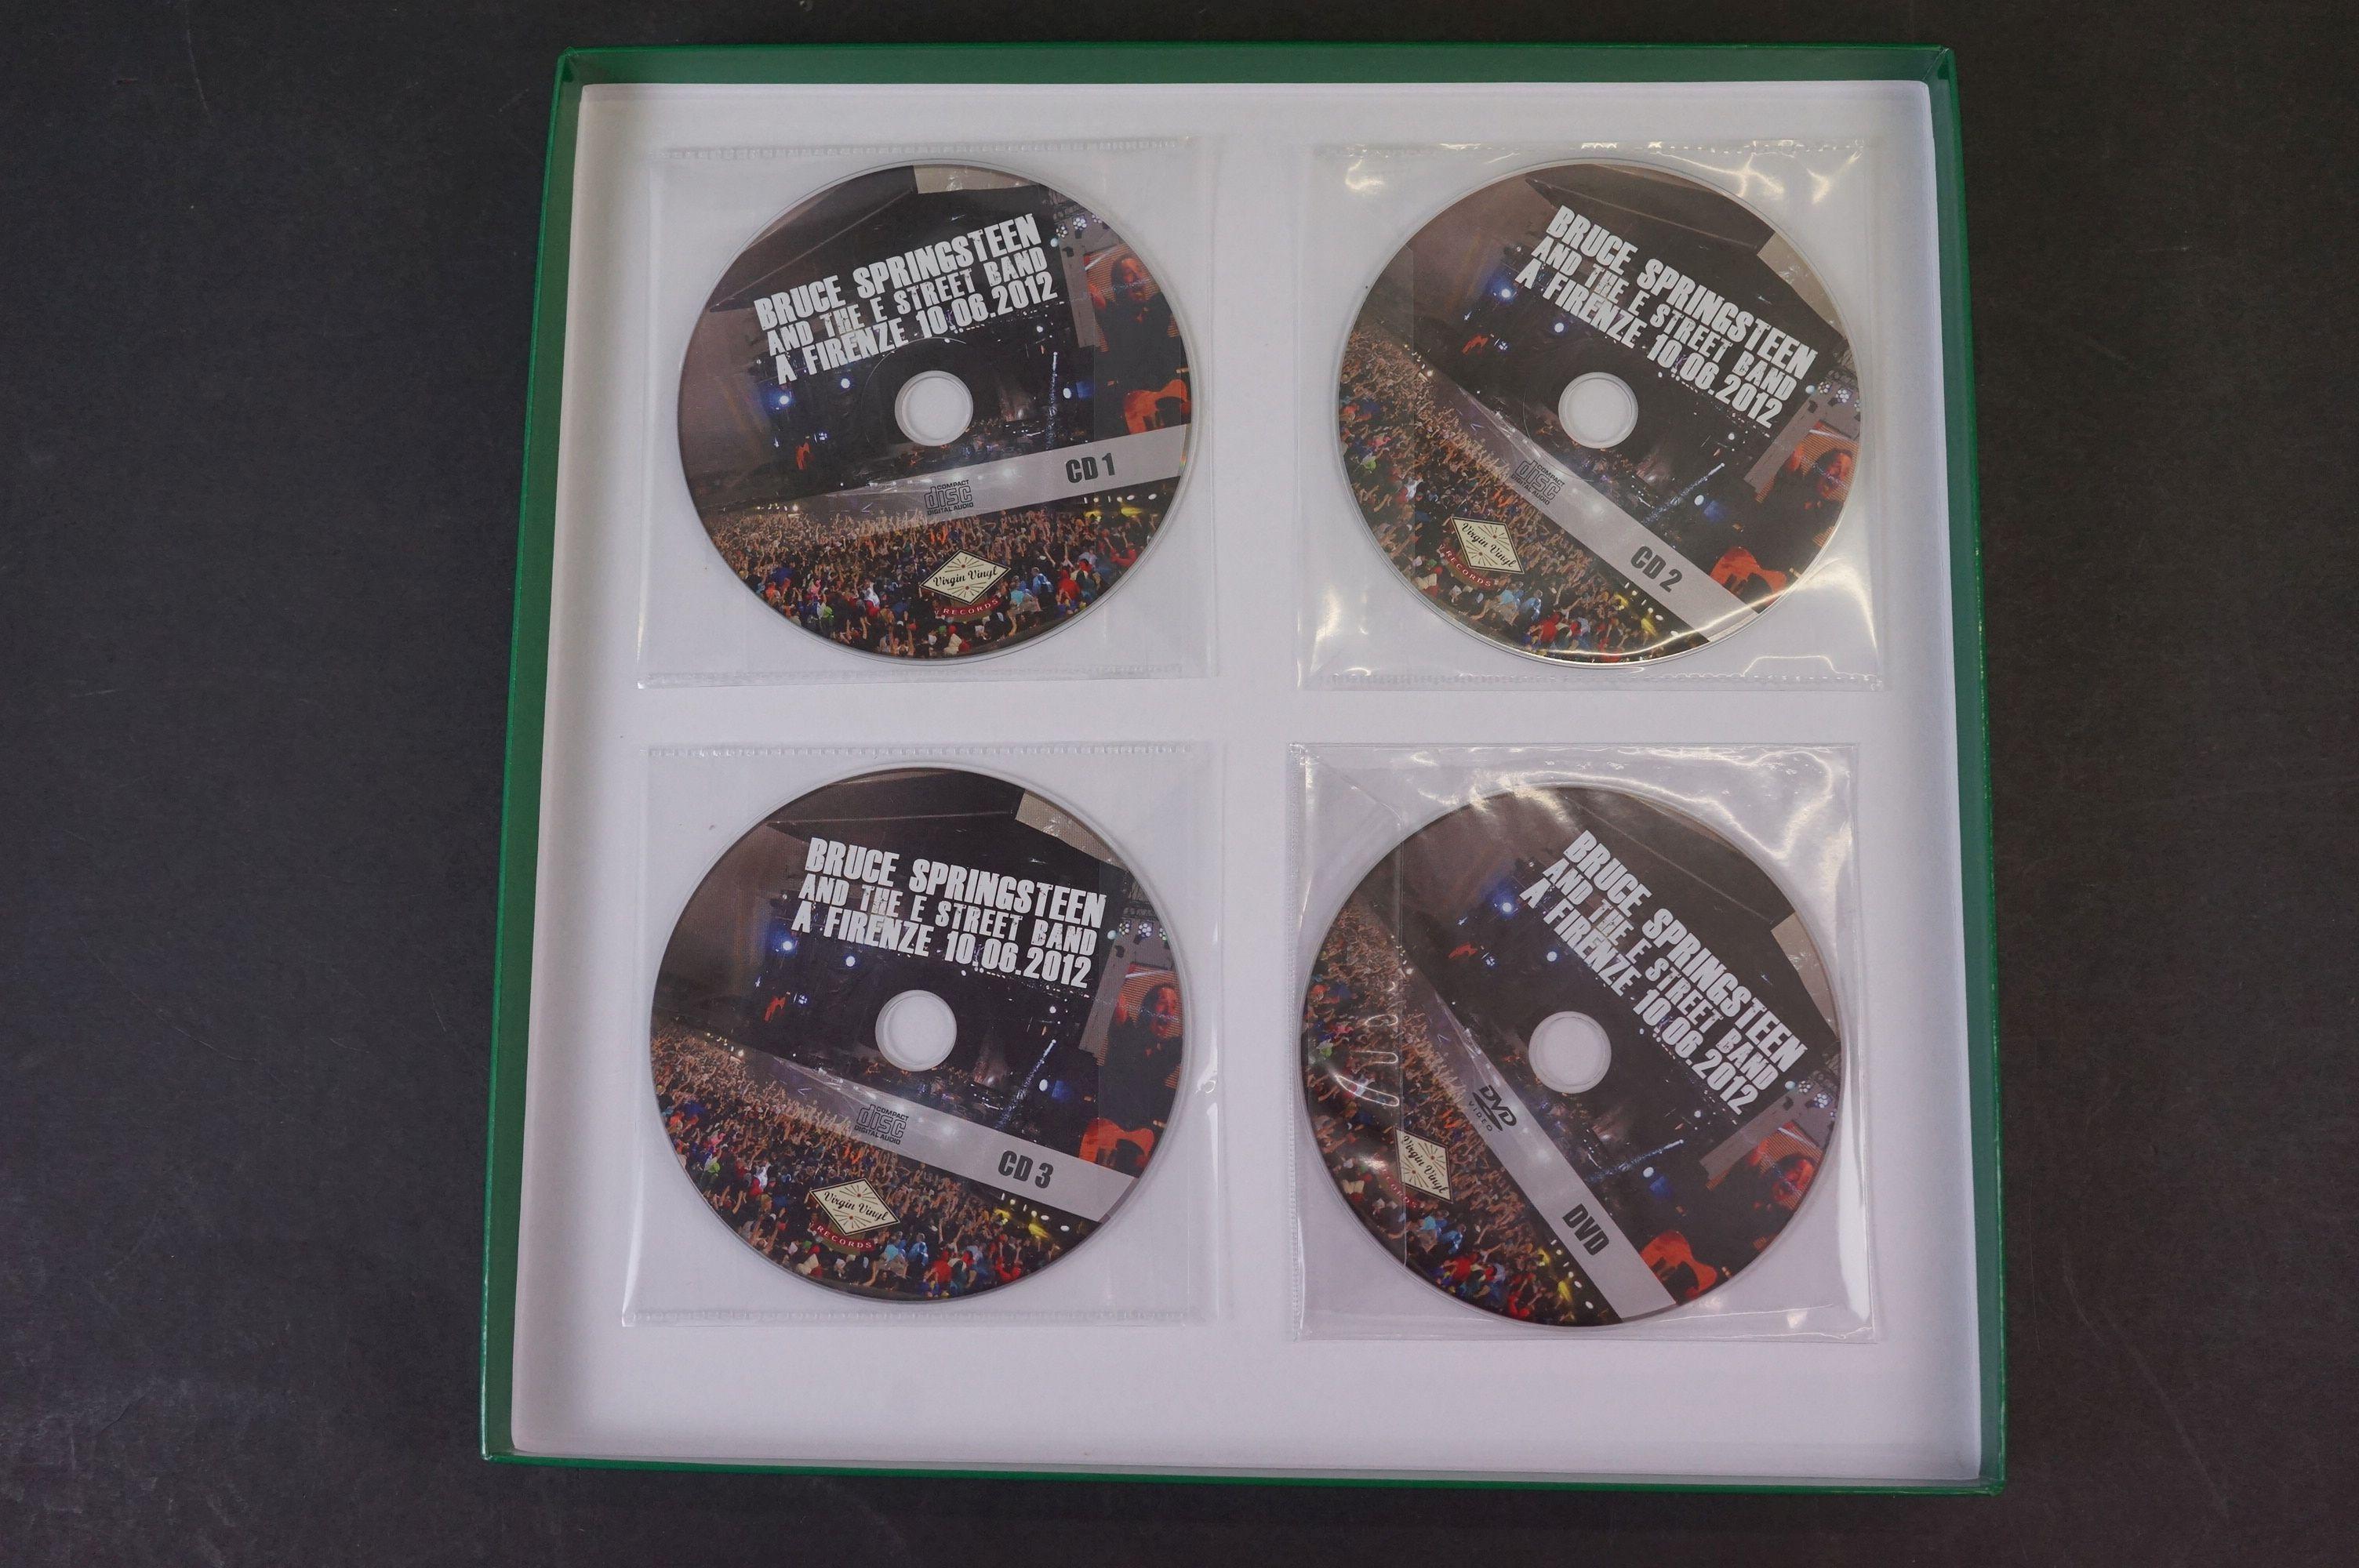 Vinyl - ltd edn Bruce Springsteen and The E Street Band A Firenze 10.06.2012 5 LP 3 CD 1 DVD heavy - Image 2 of 10